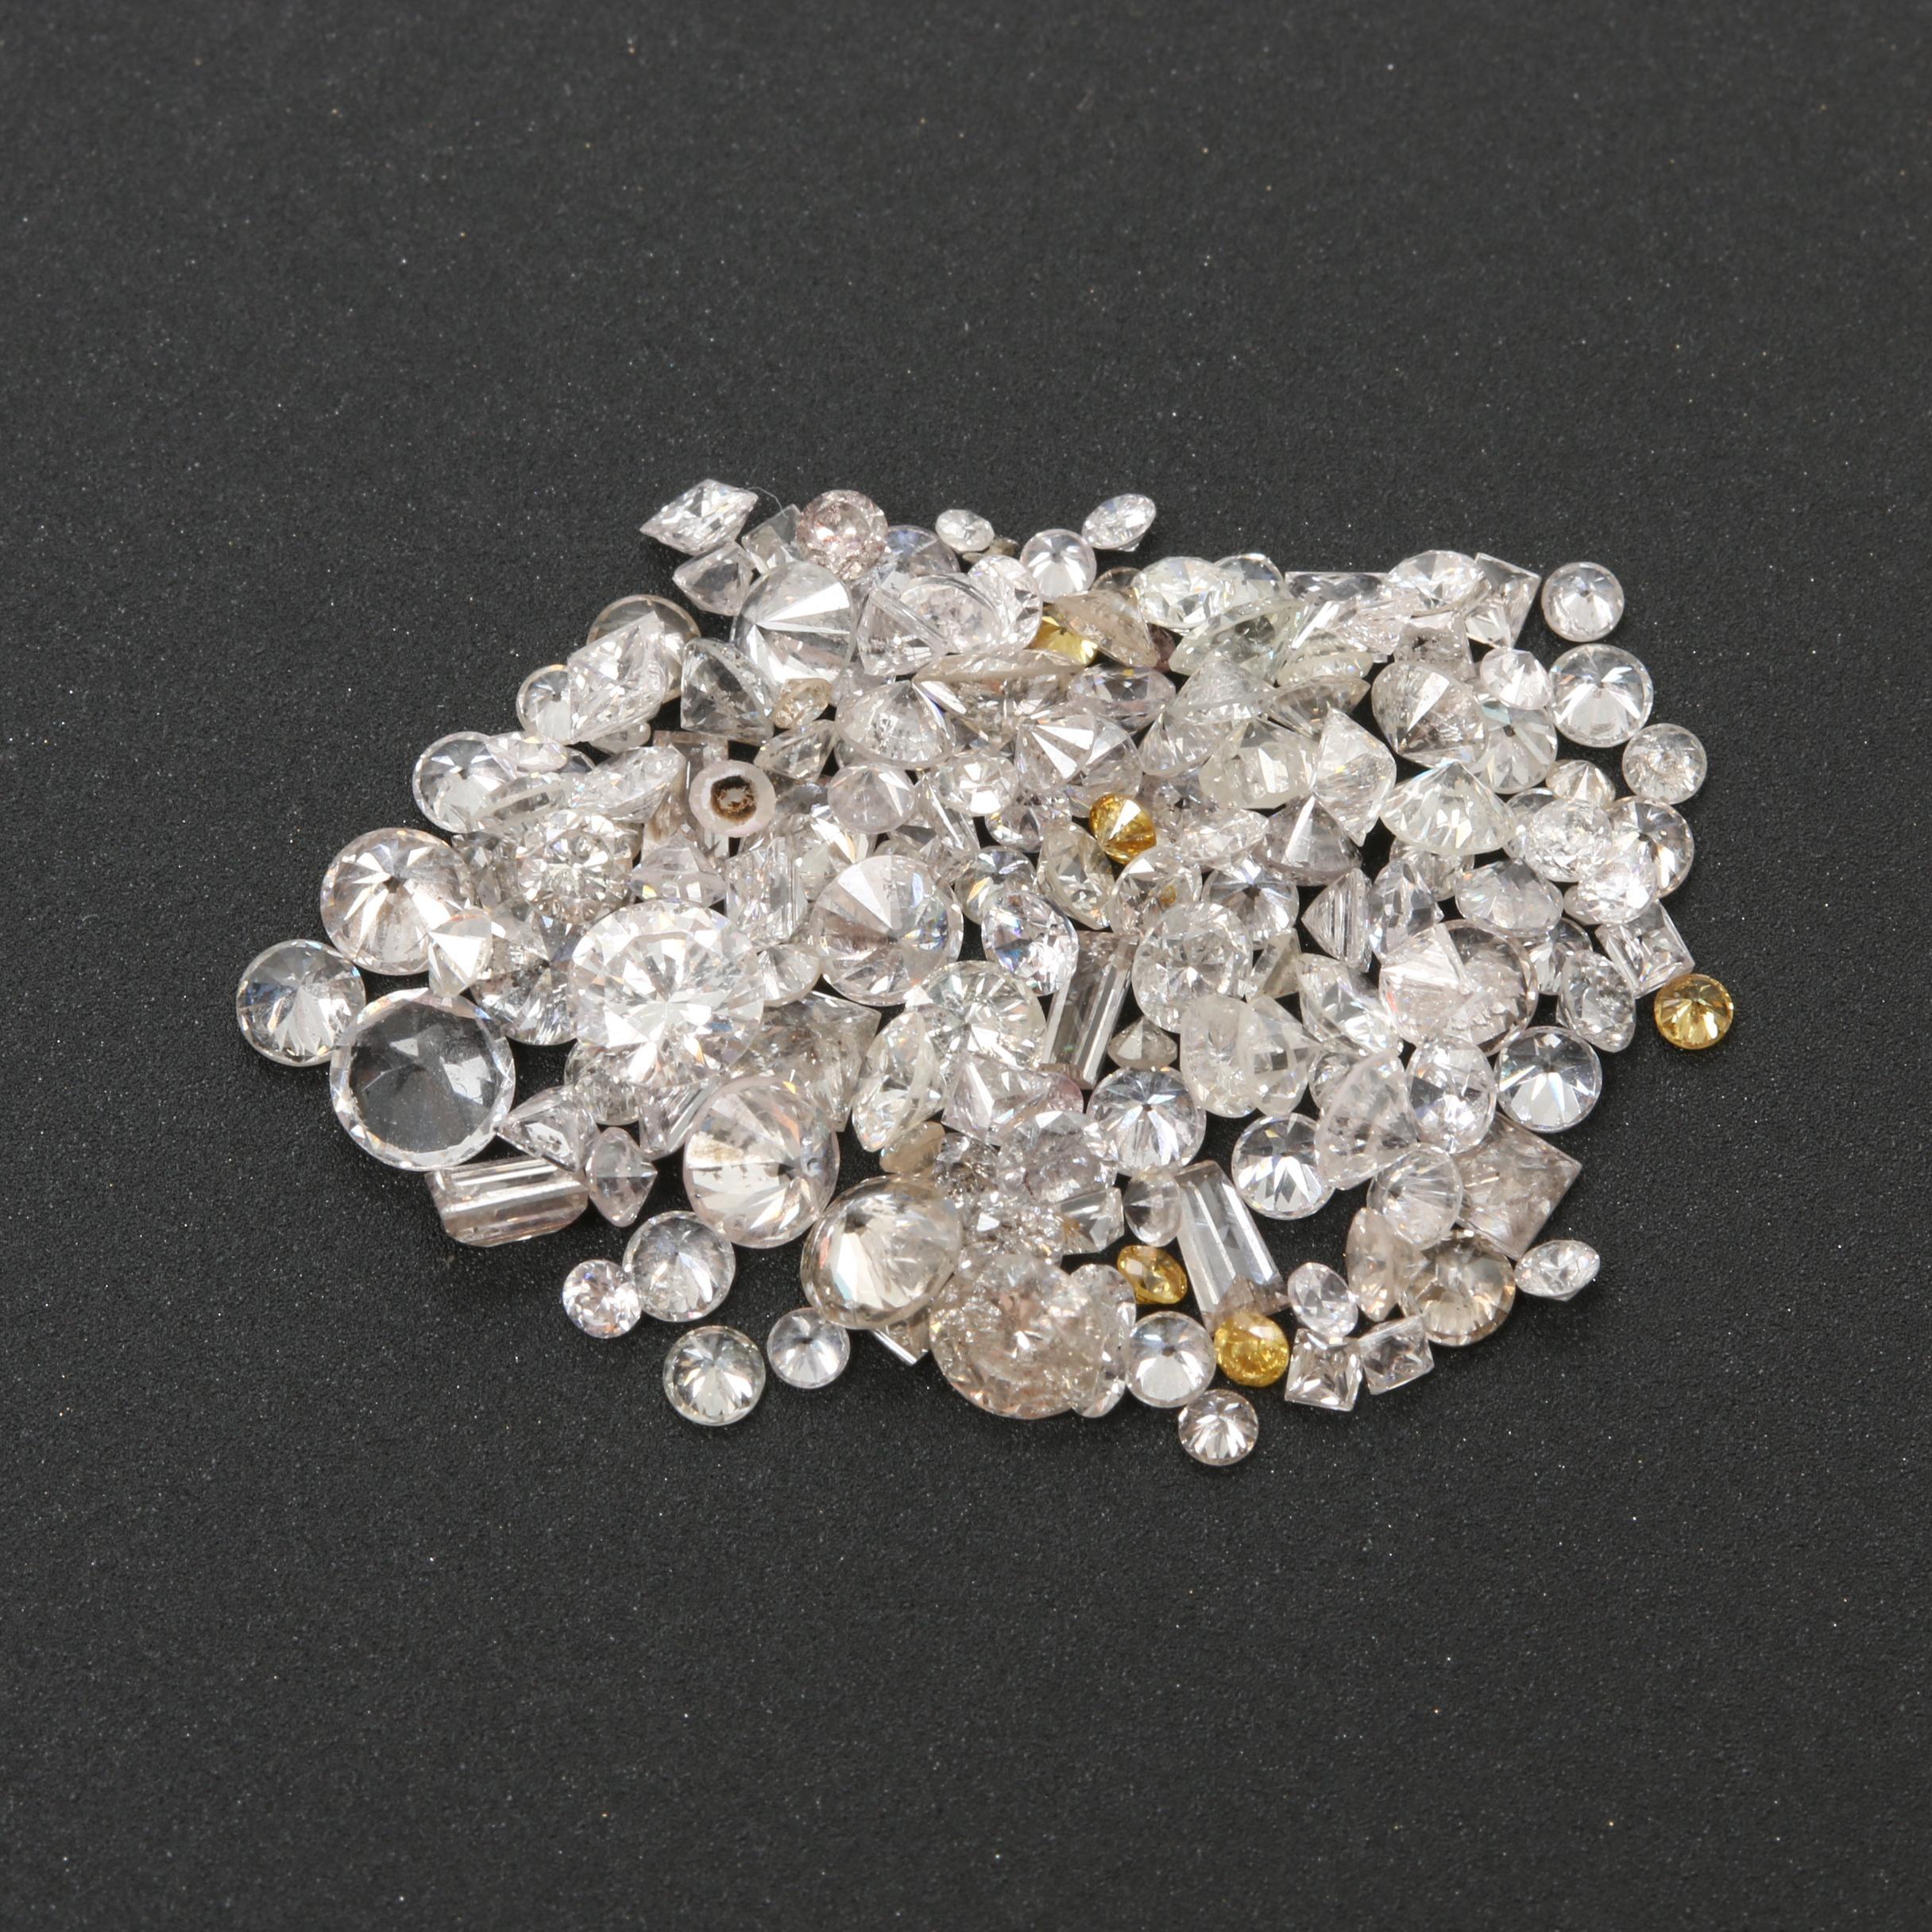 Loose 4.19 CTW Diamond Assortment